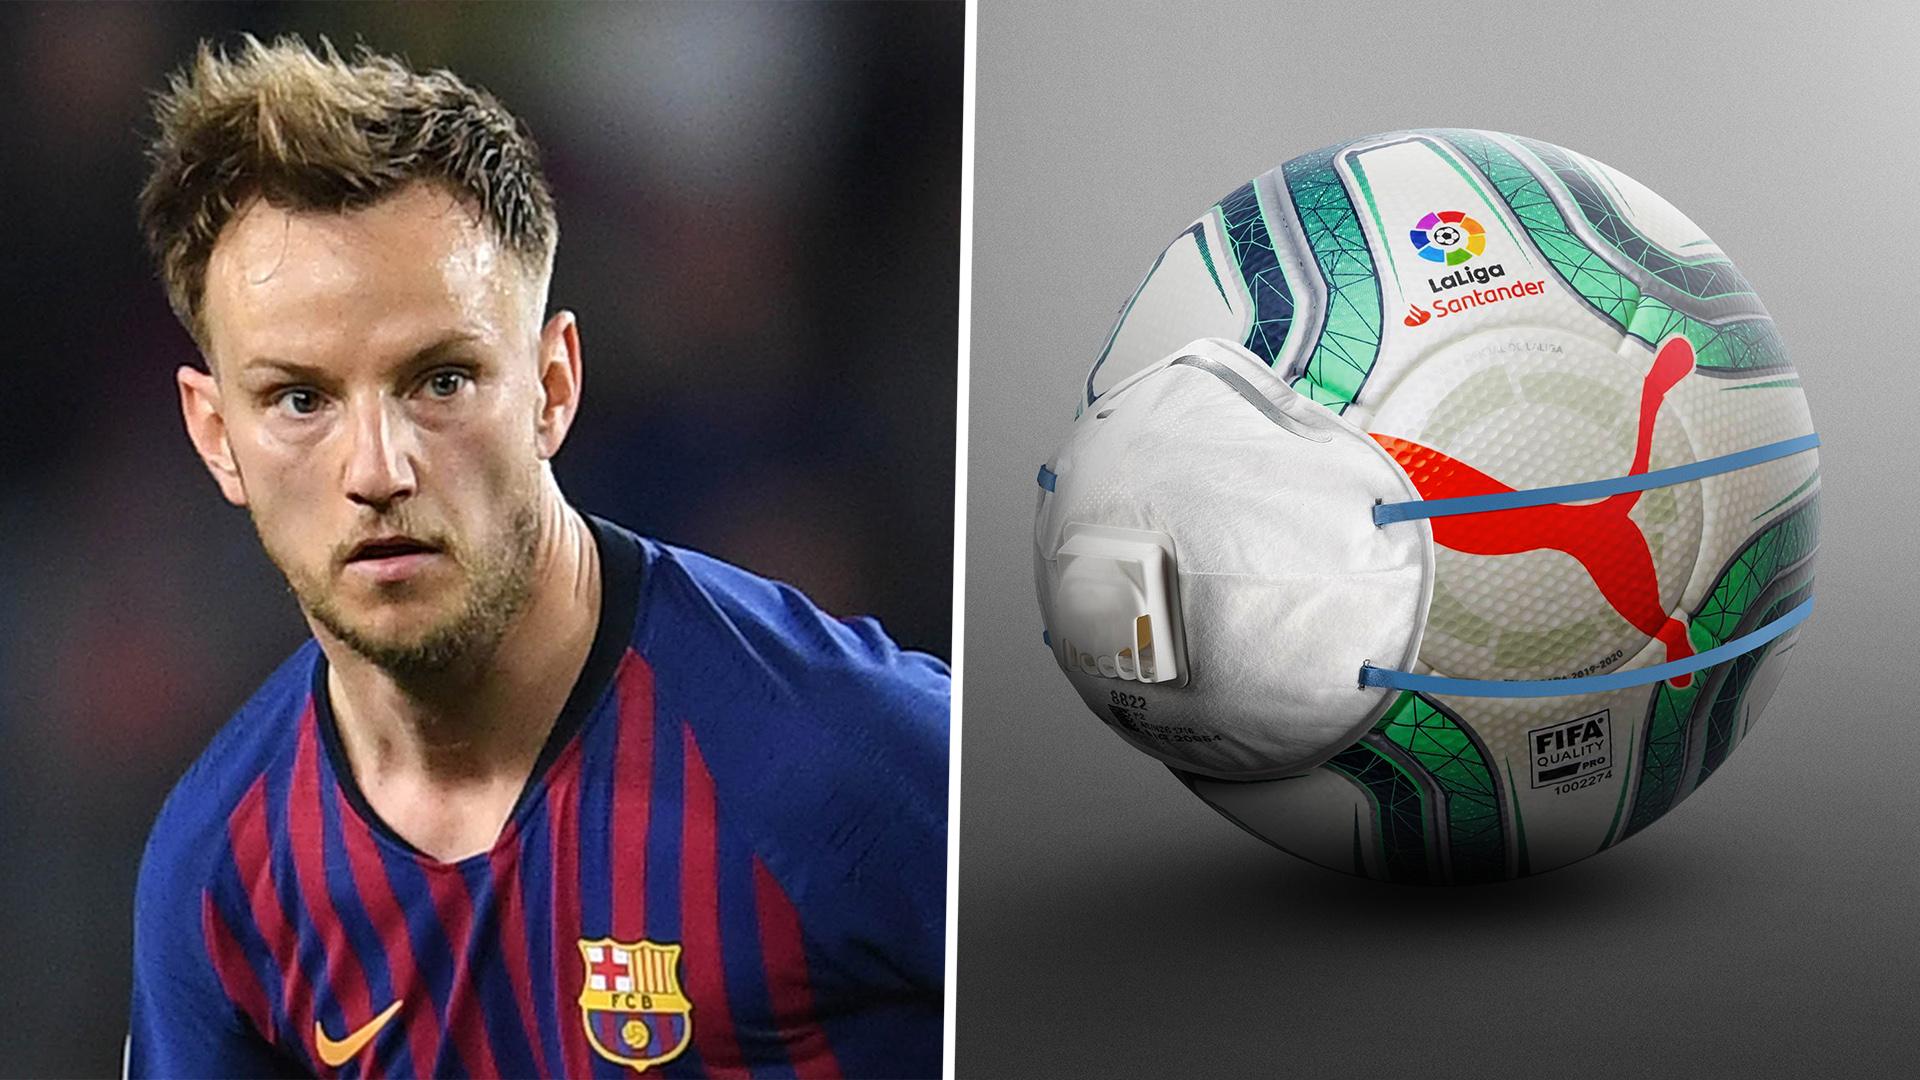 Coronavirus: Barcelona star Rakitic ready to 'risk' his health to resume football in Spain